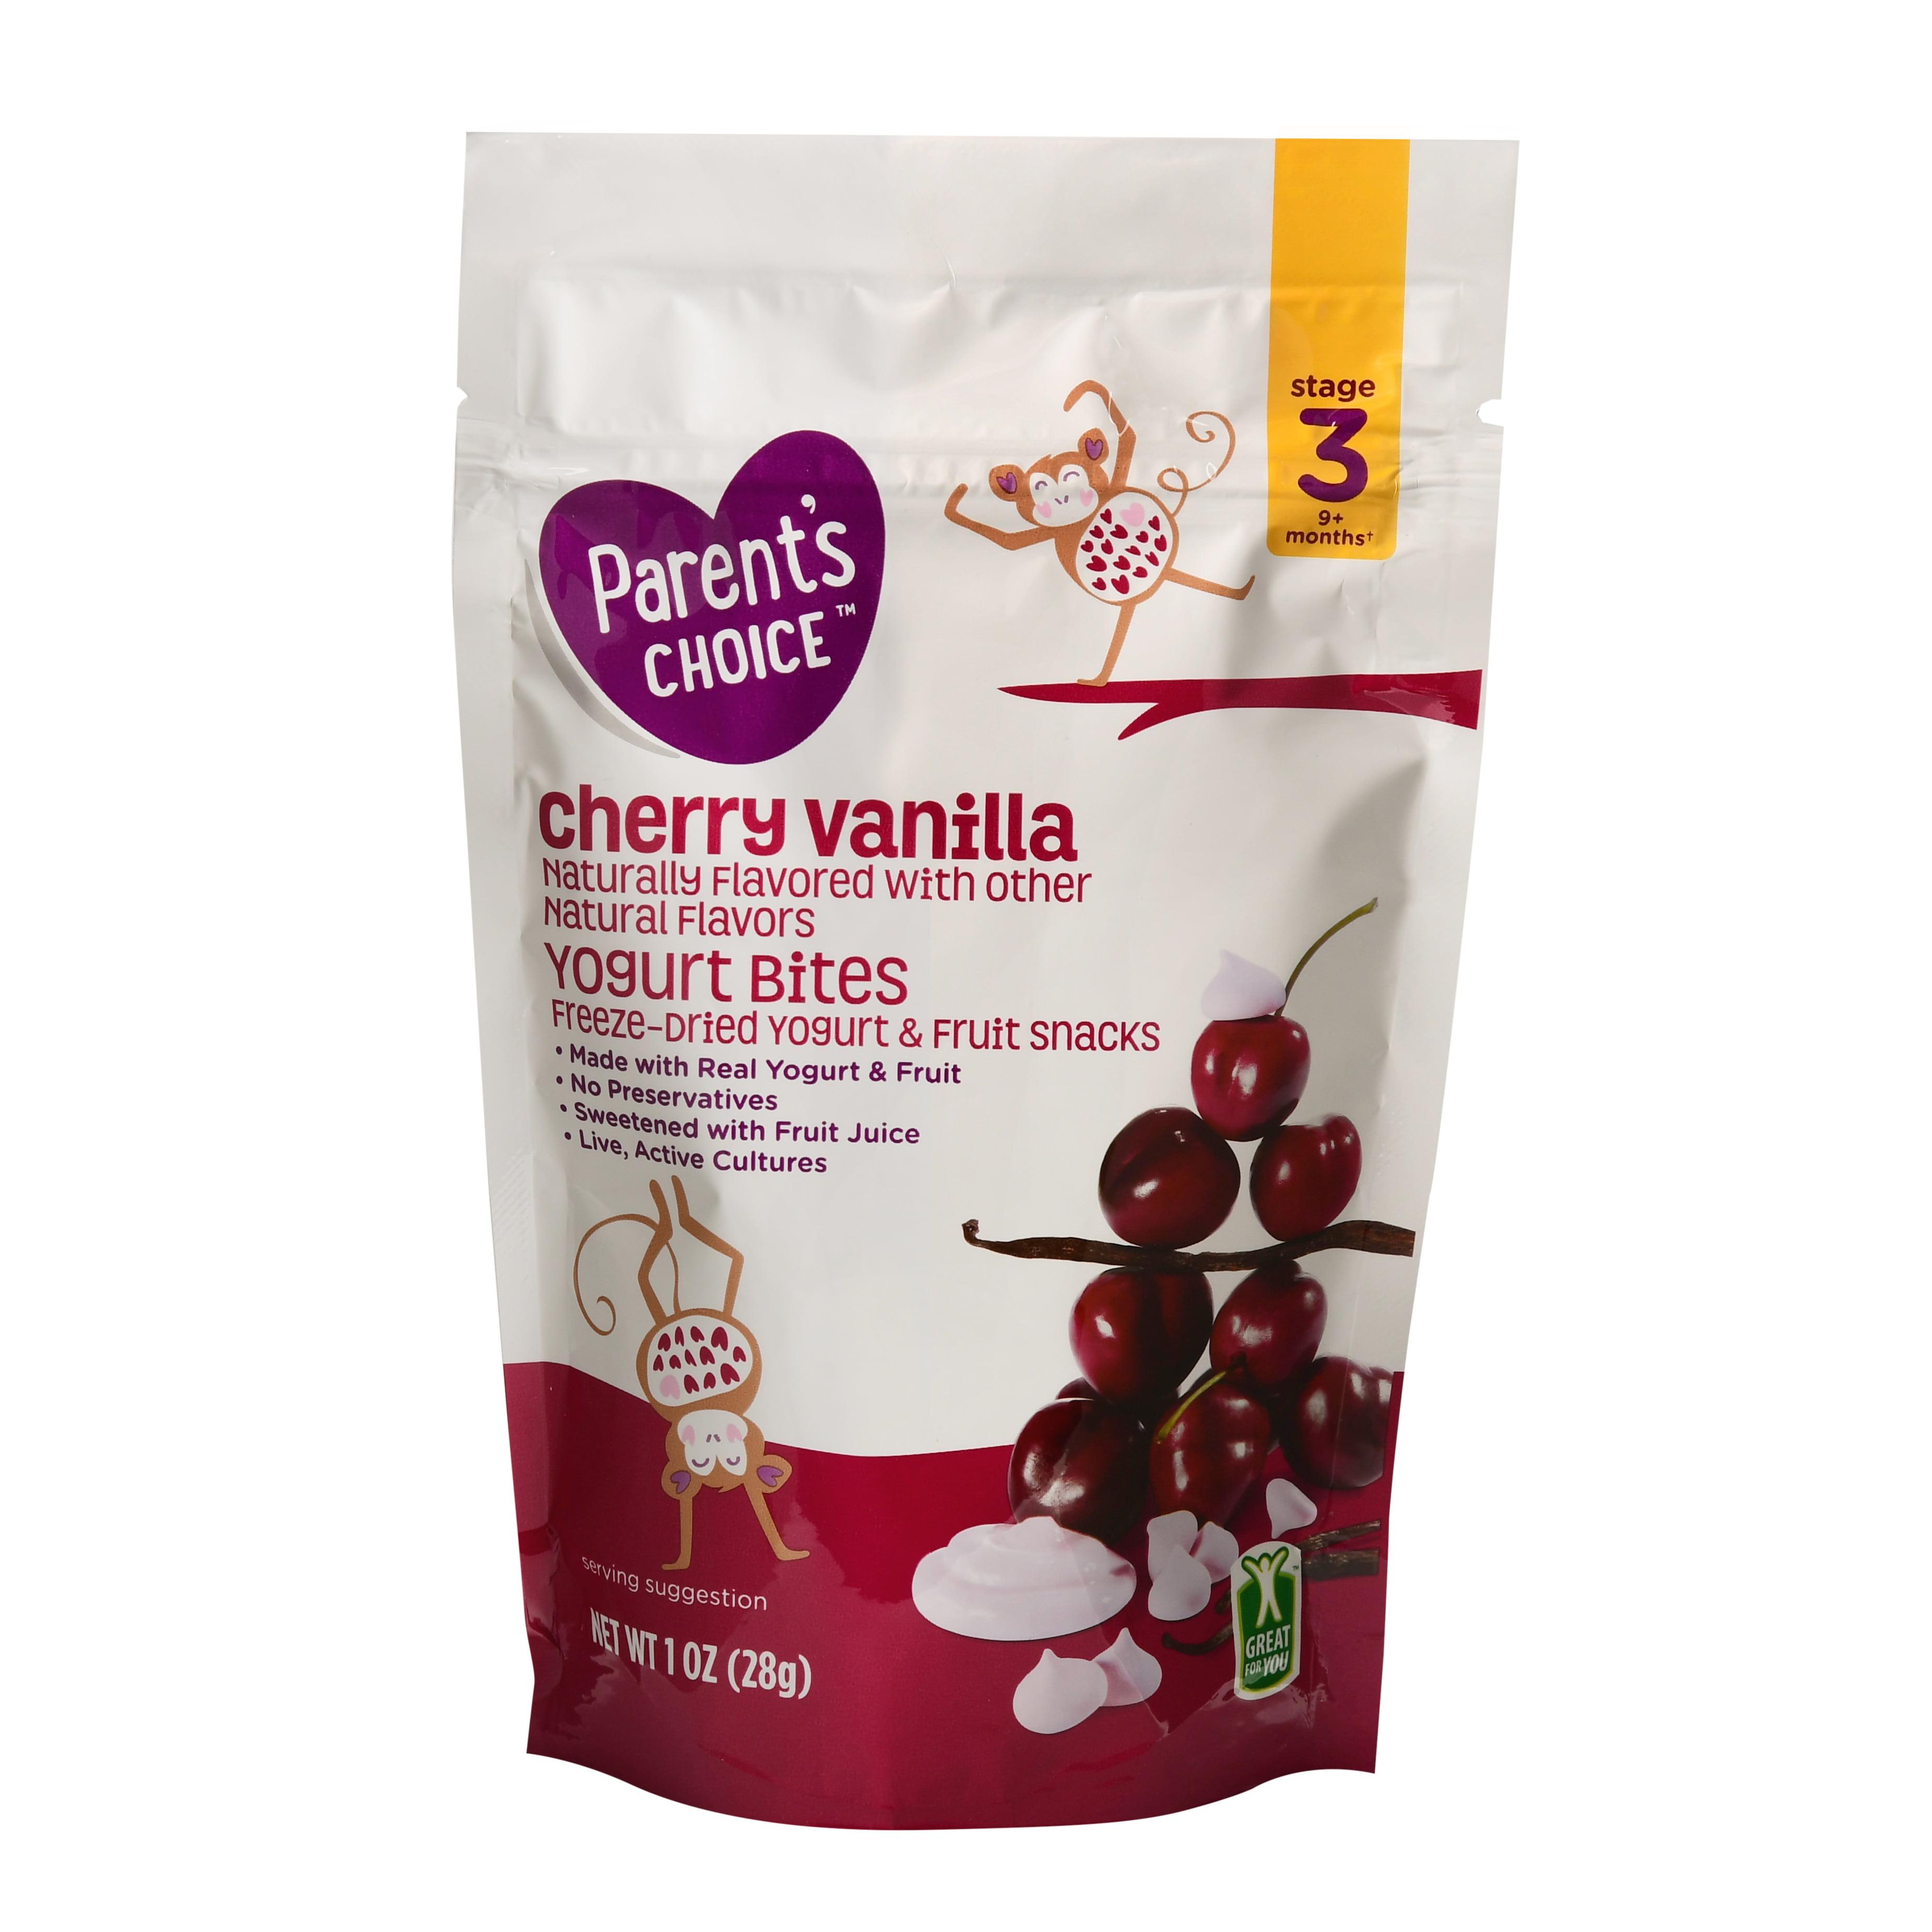 Parent's Choice Yogurt Bites, Cherry Vanilla, Stage 3, 1 oz